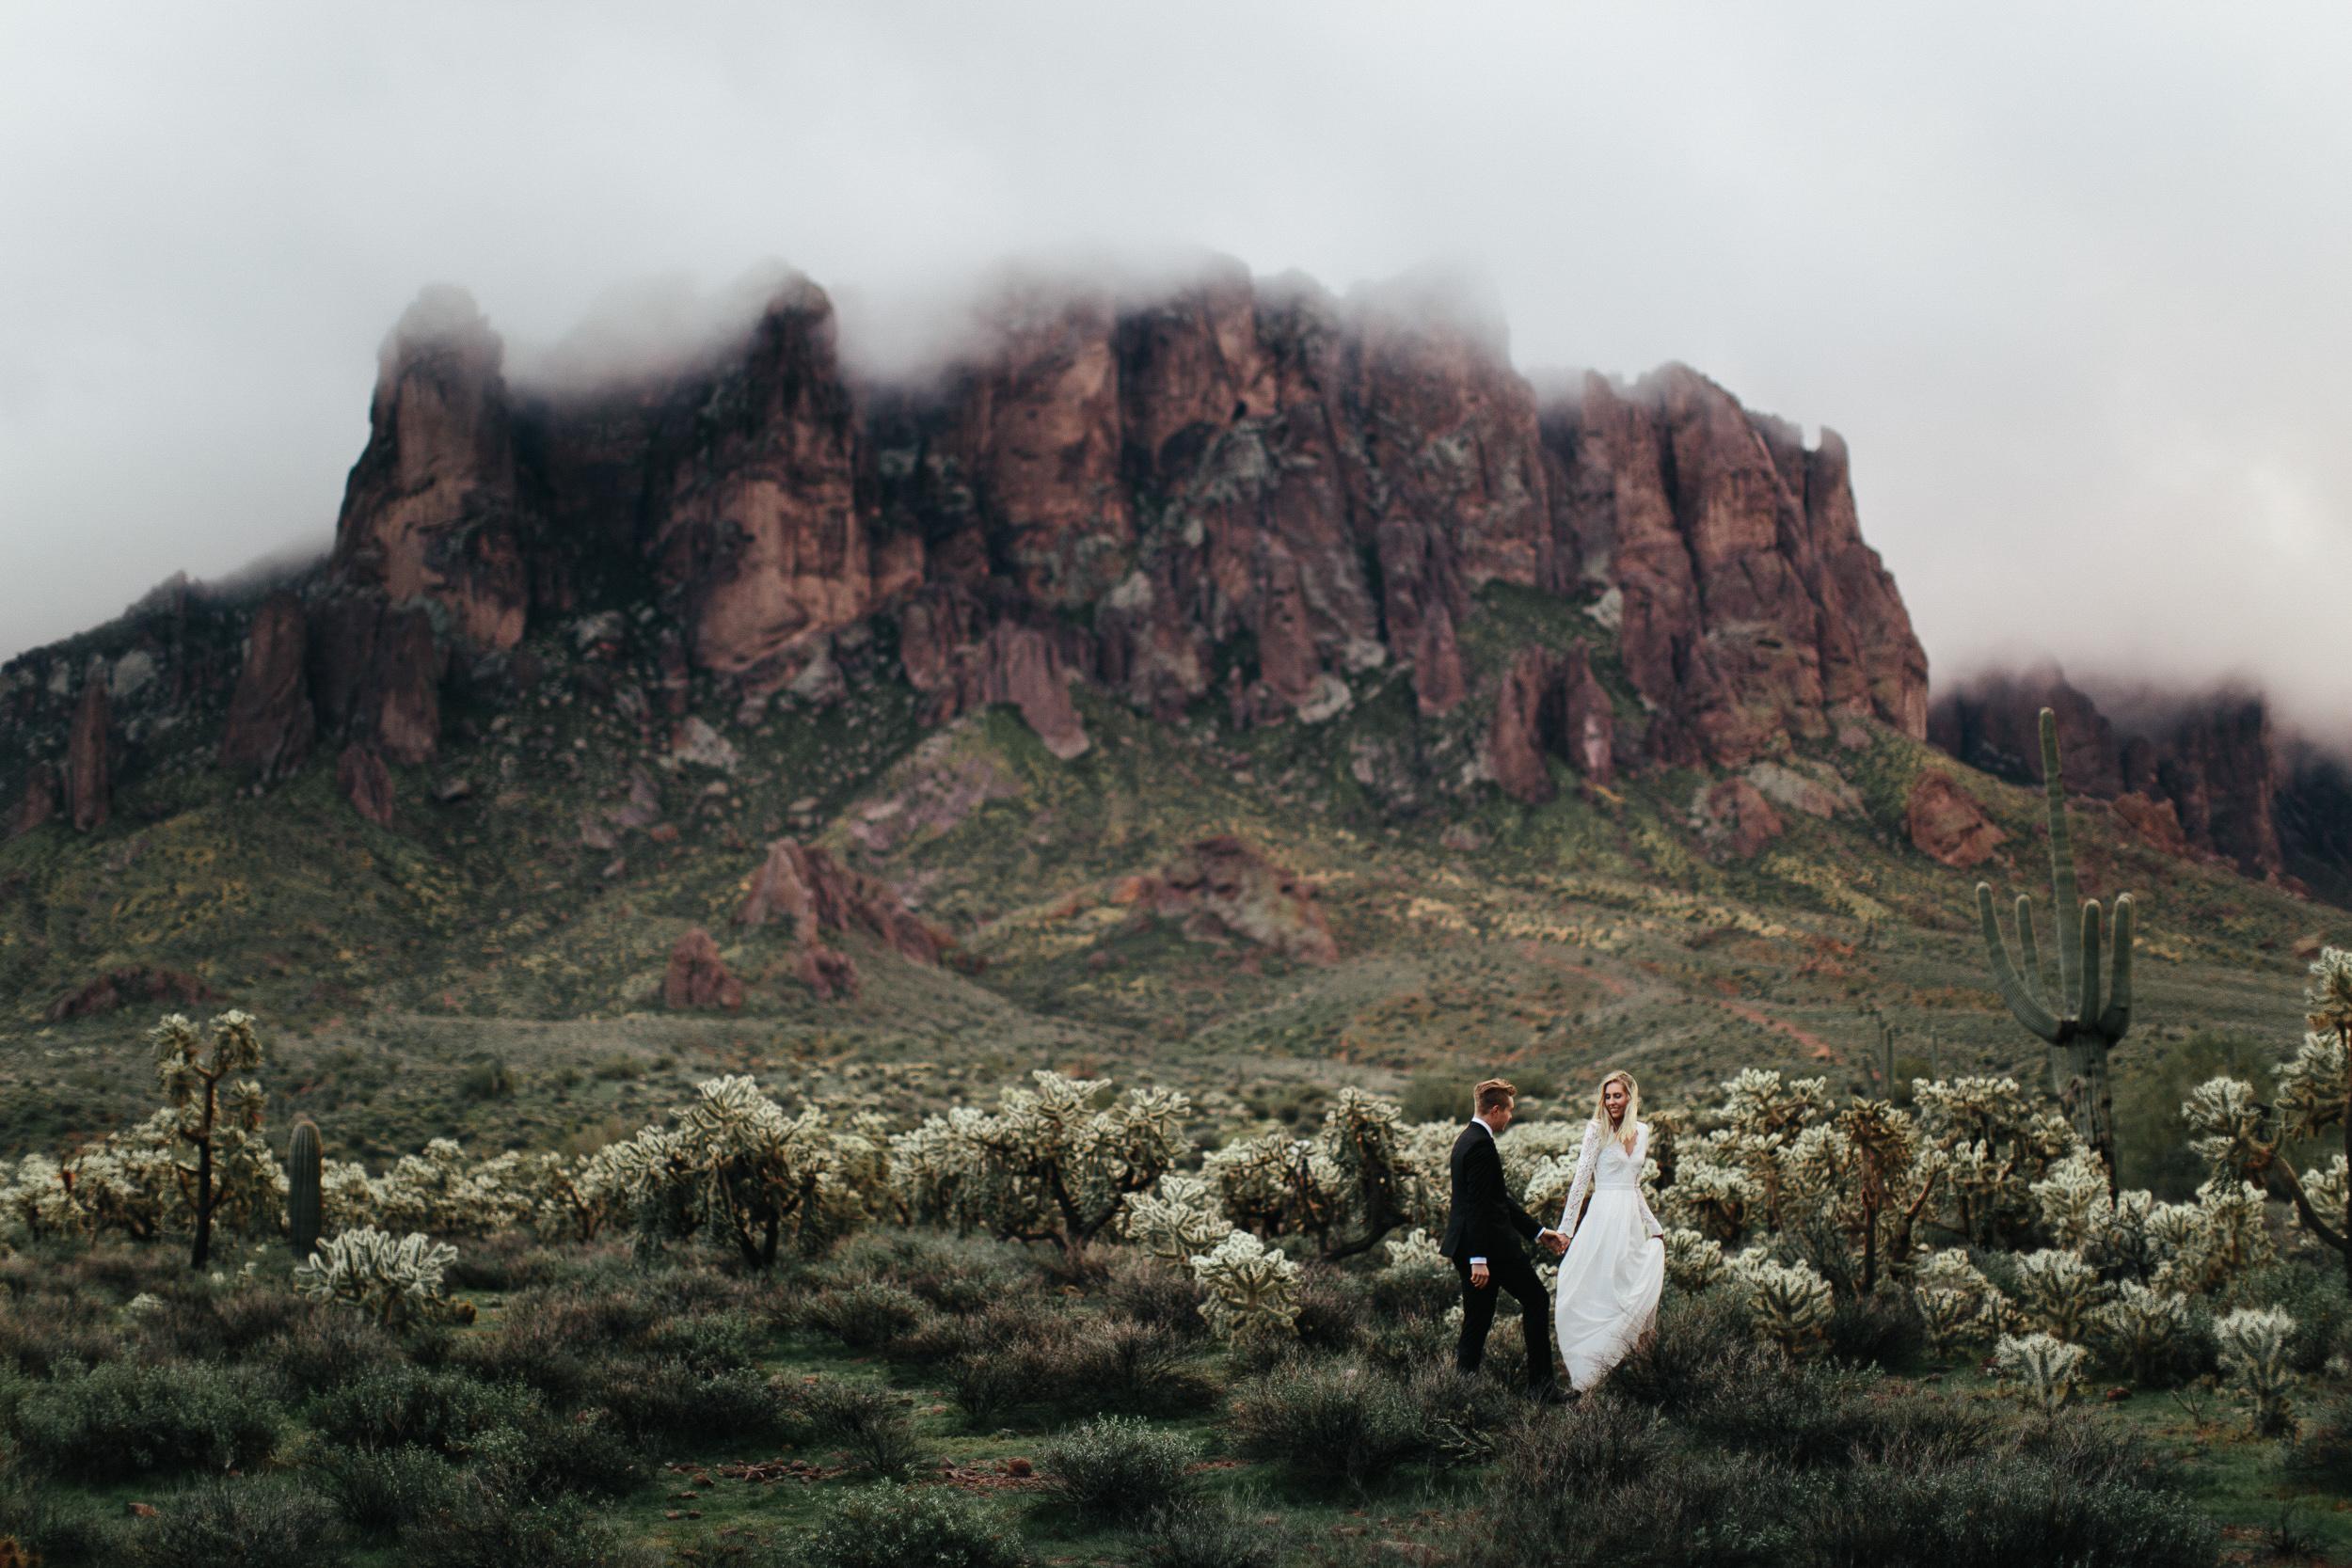 phoenix-mesa-elopement-wedding-photographer-lost-dutchman-state-park-superstitious-mountains-30.jpg